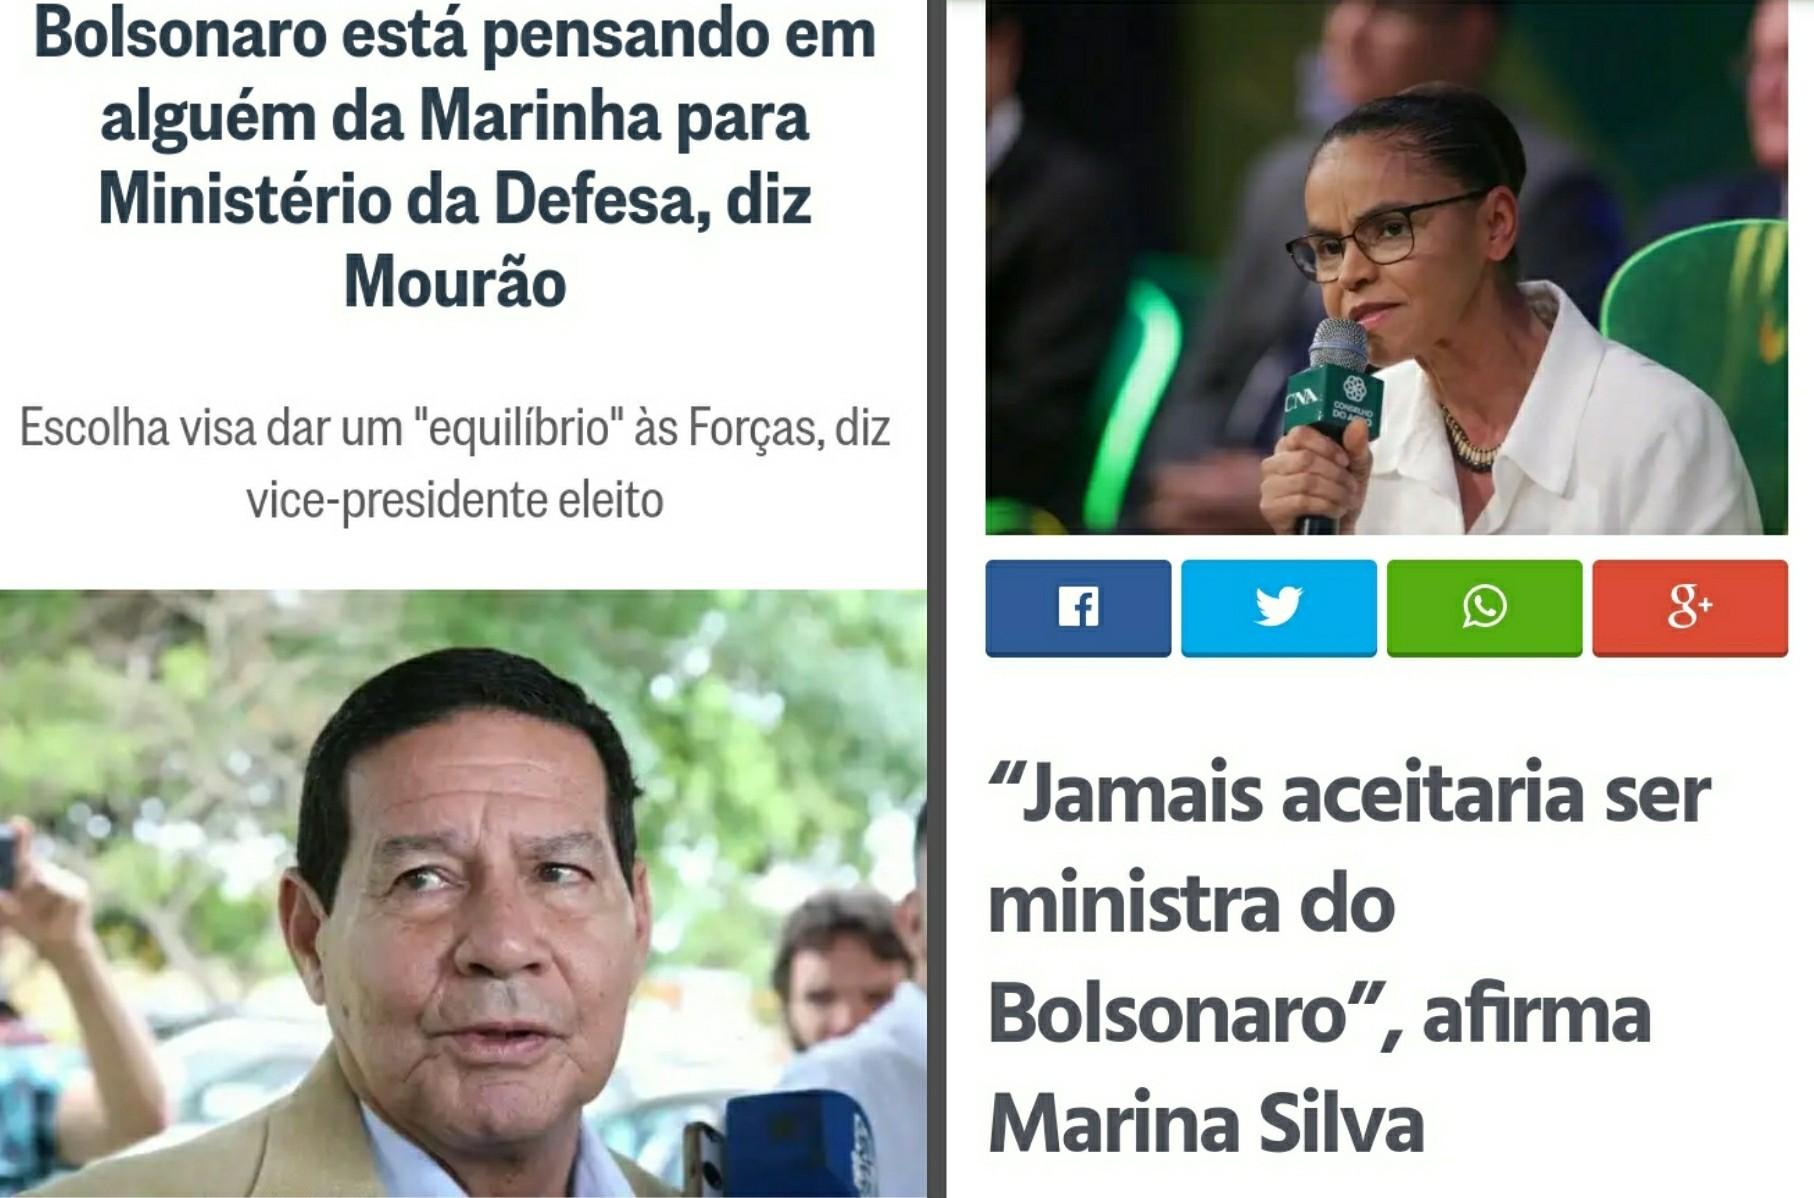 Combater nas Marinas do Brasil - meme